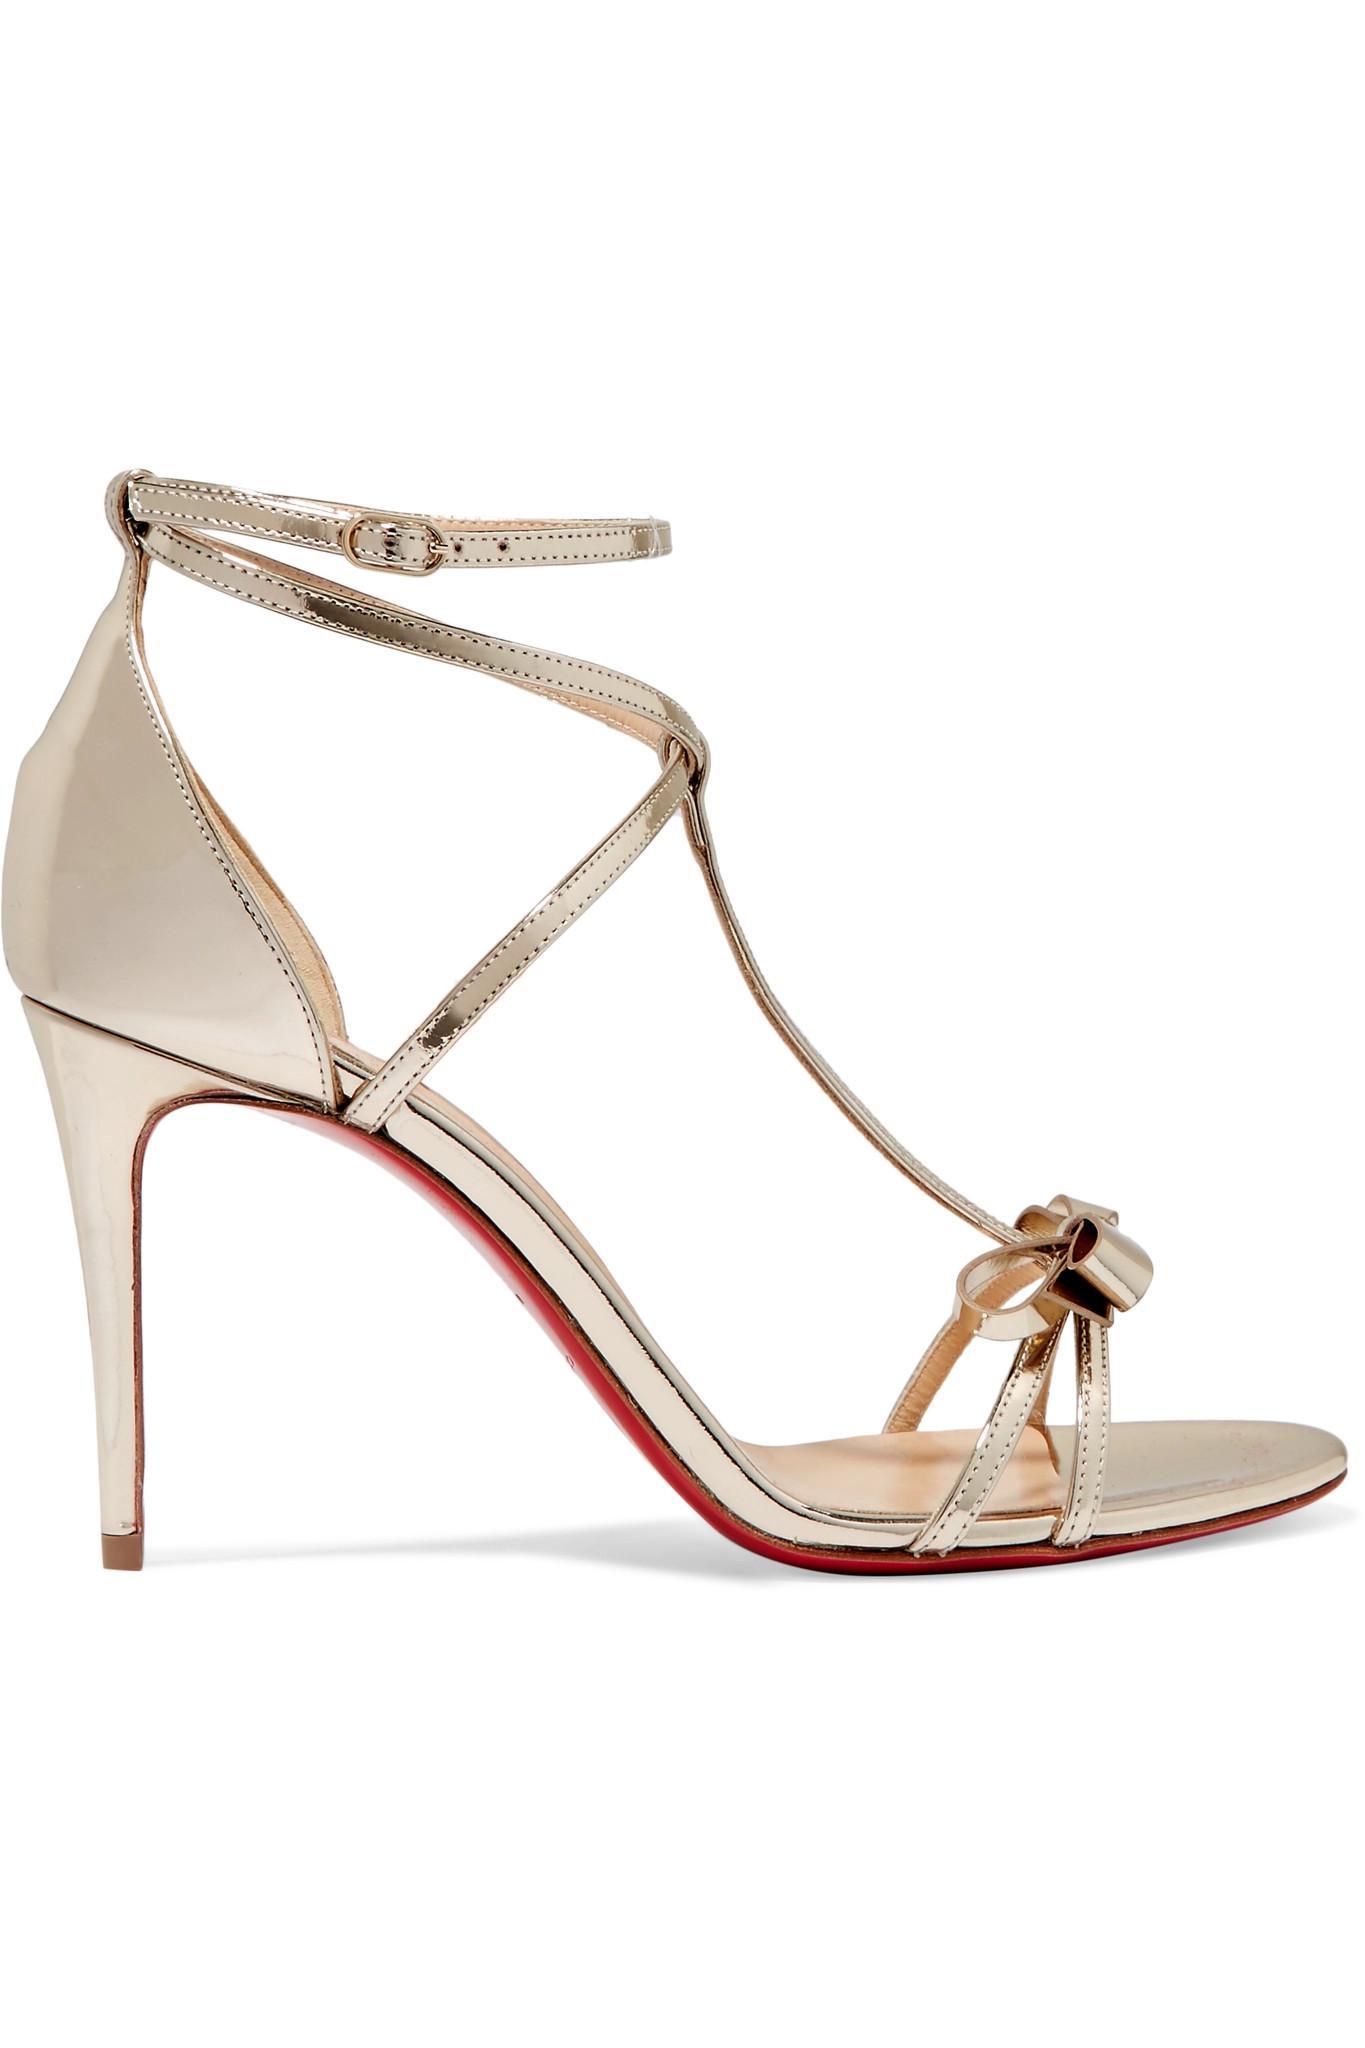 6a7dee0b5ea7 Christian Louboutin Blakissima 85 Bow-embellished Metallic Leather ...